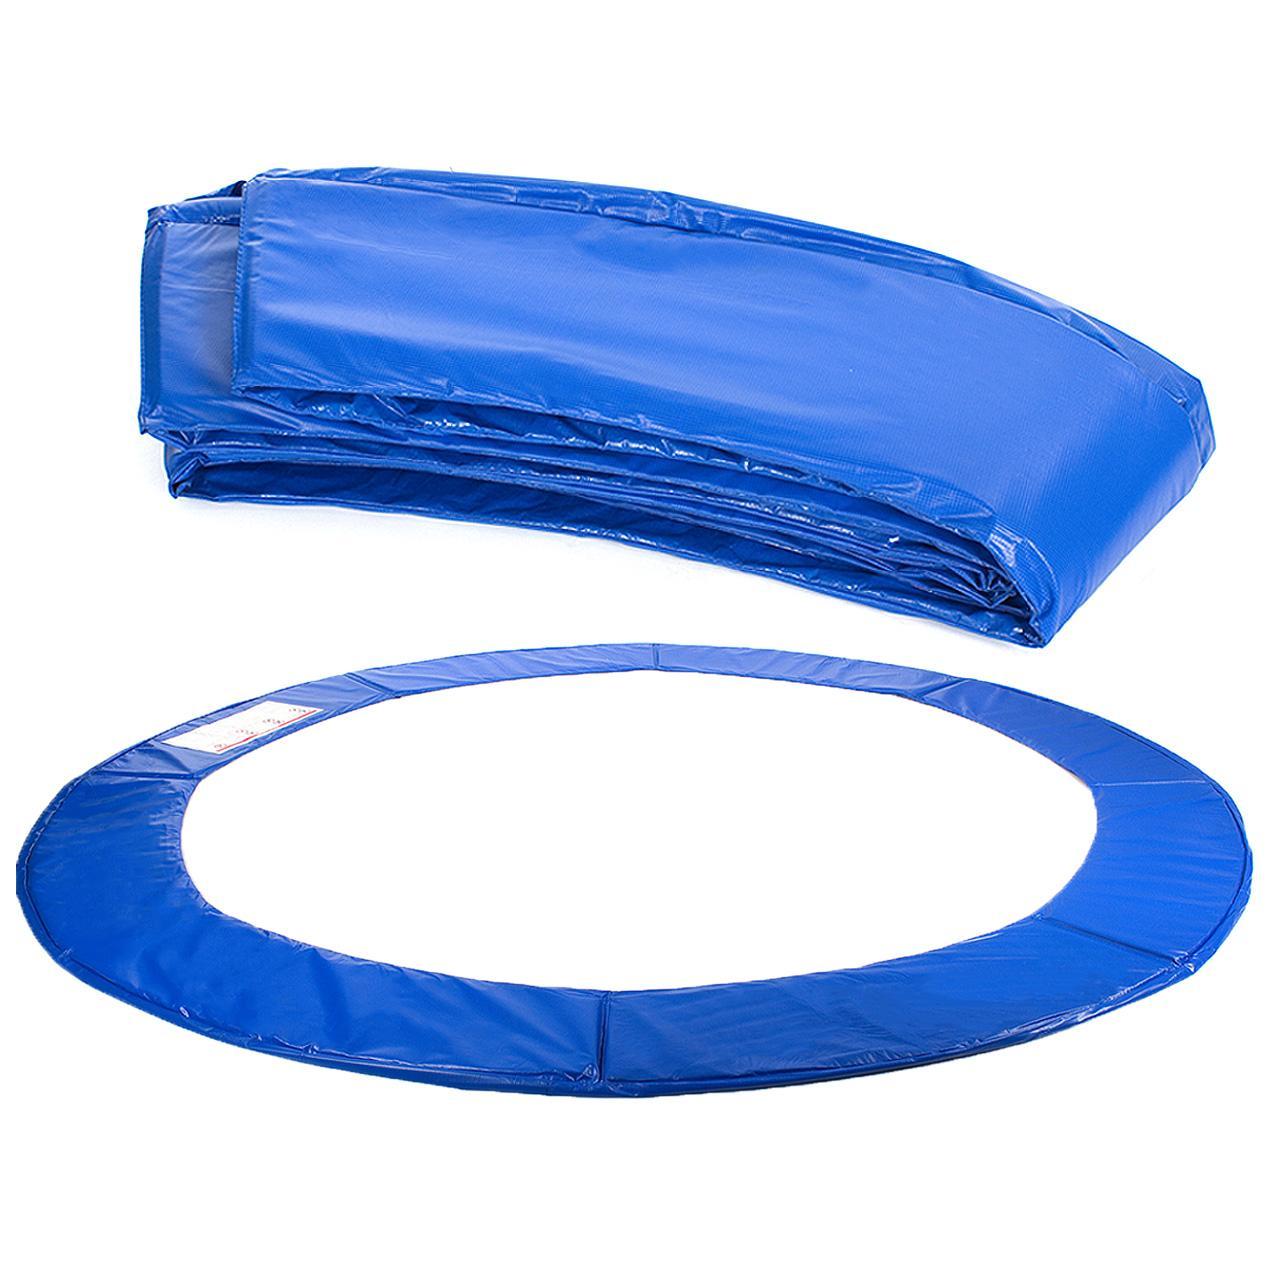 randabdeckung federabdeckung f r trampolin 250 310 370 400 430 490cm randschutz ebay. Black Bedroom Furniture Sets. Home Design Ideas